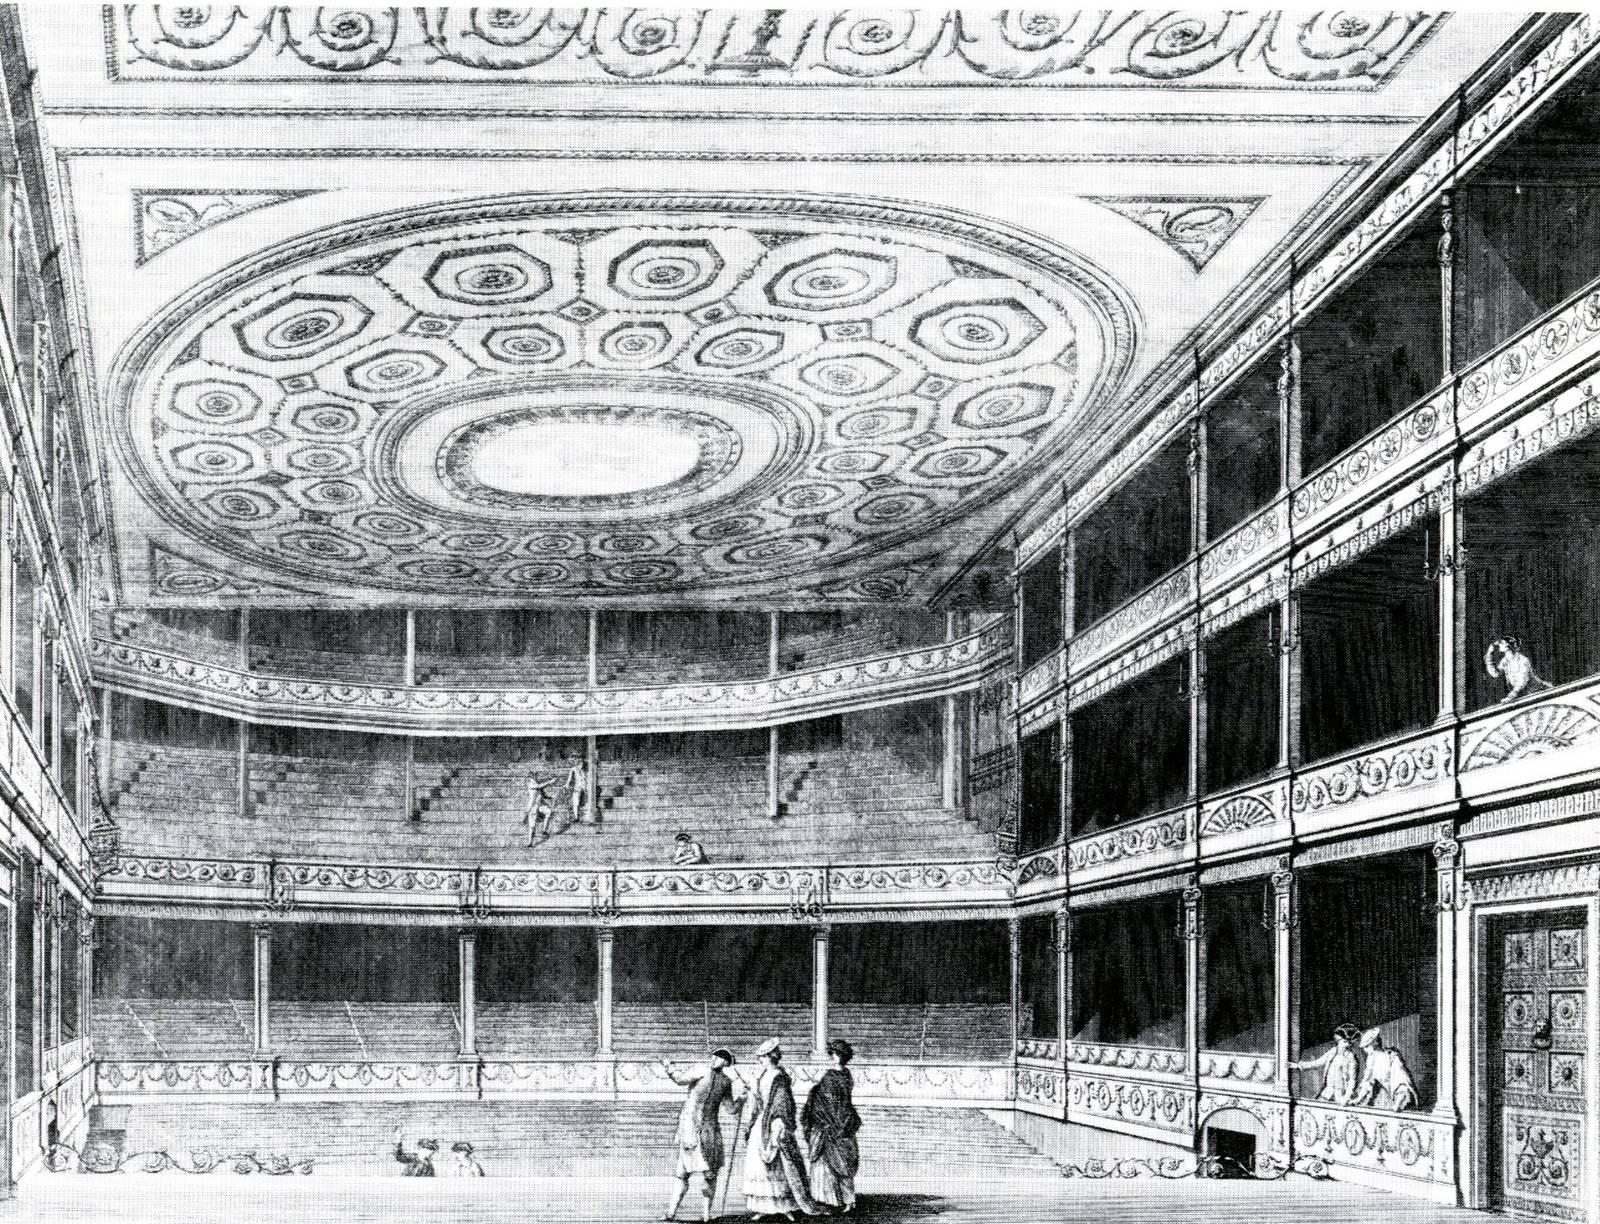 Theater datenbank / Datenbank Europäische Theaterarchitektur